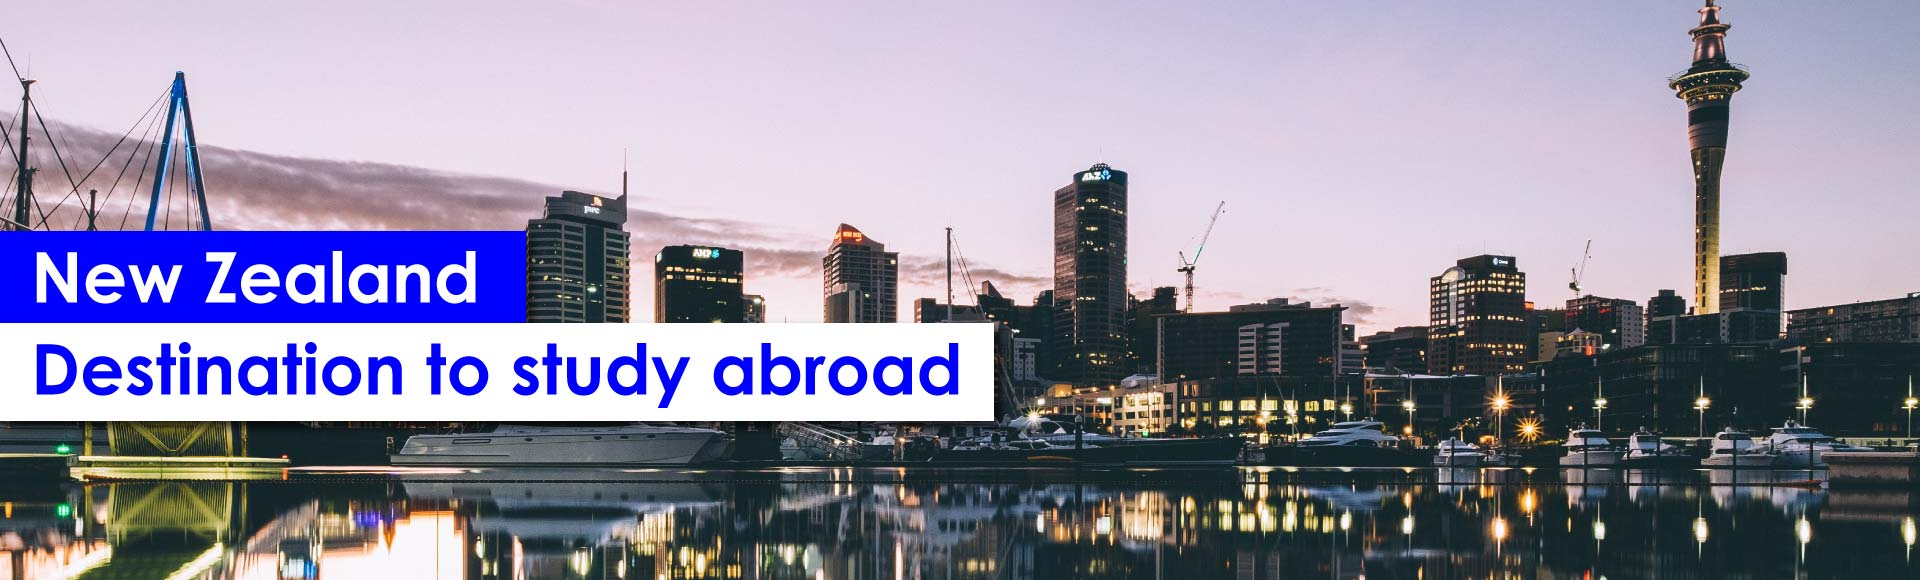 New Zealand- Destination to study abroad